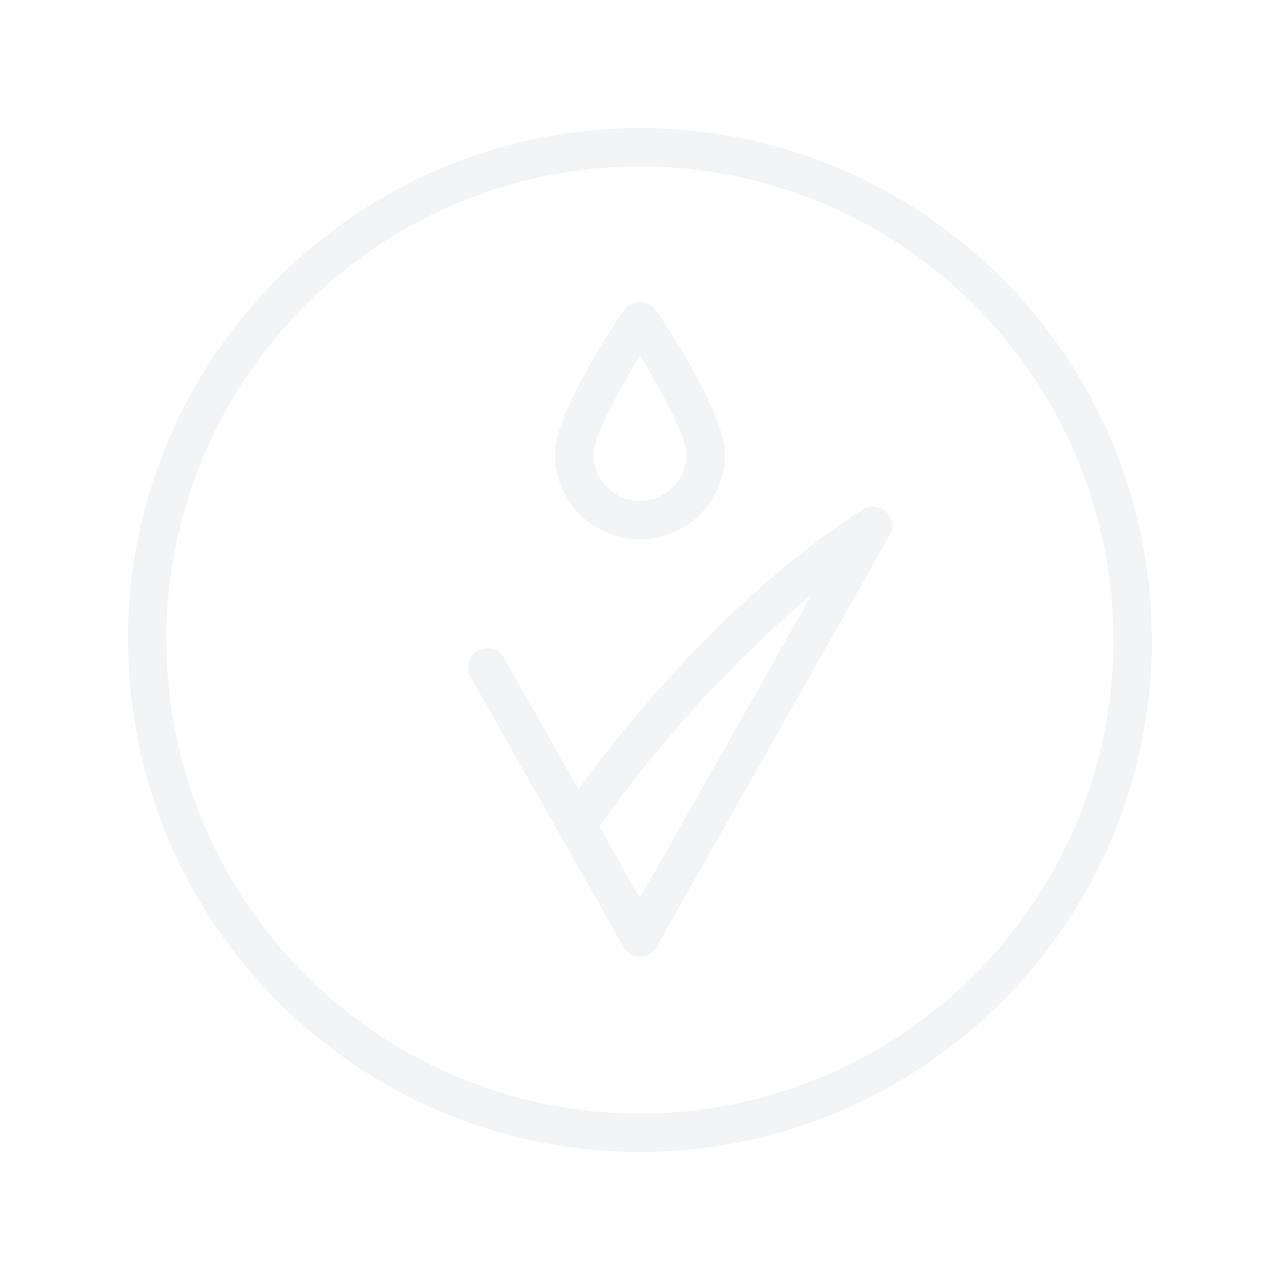 GIORGIO ARMANI Emporio In Love With You Eau De Parfum